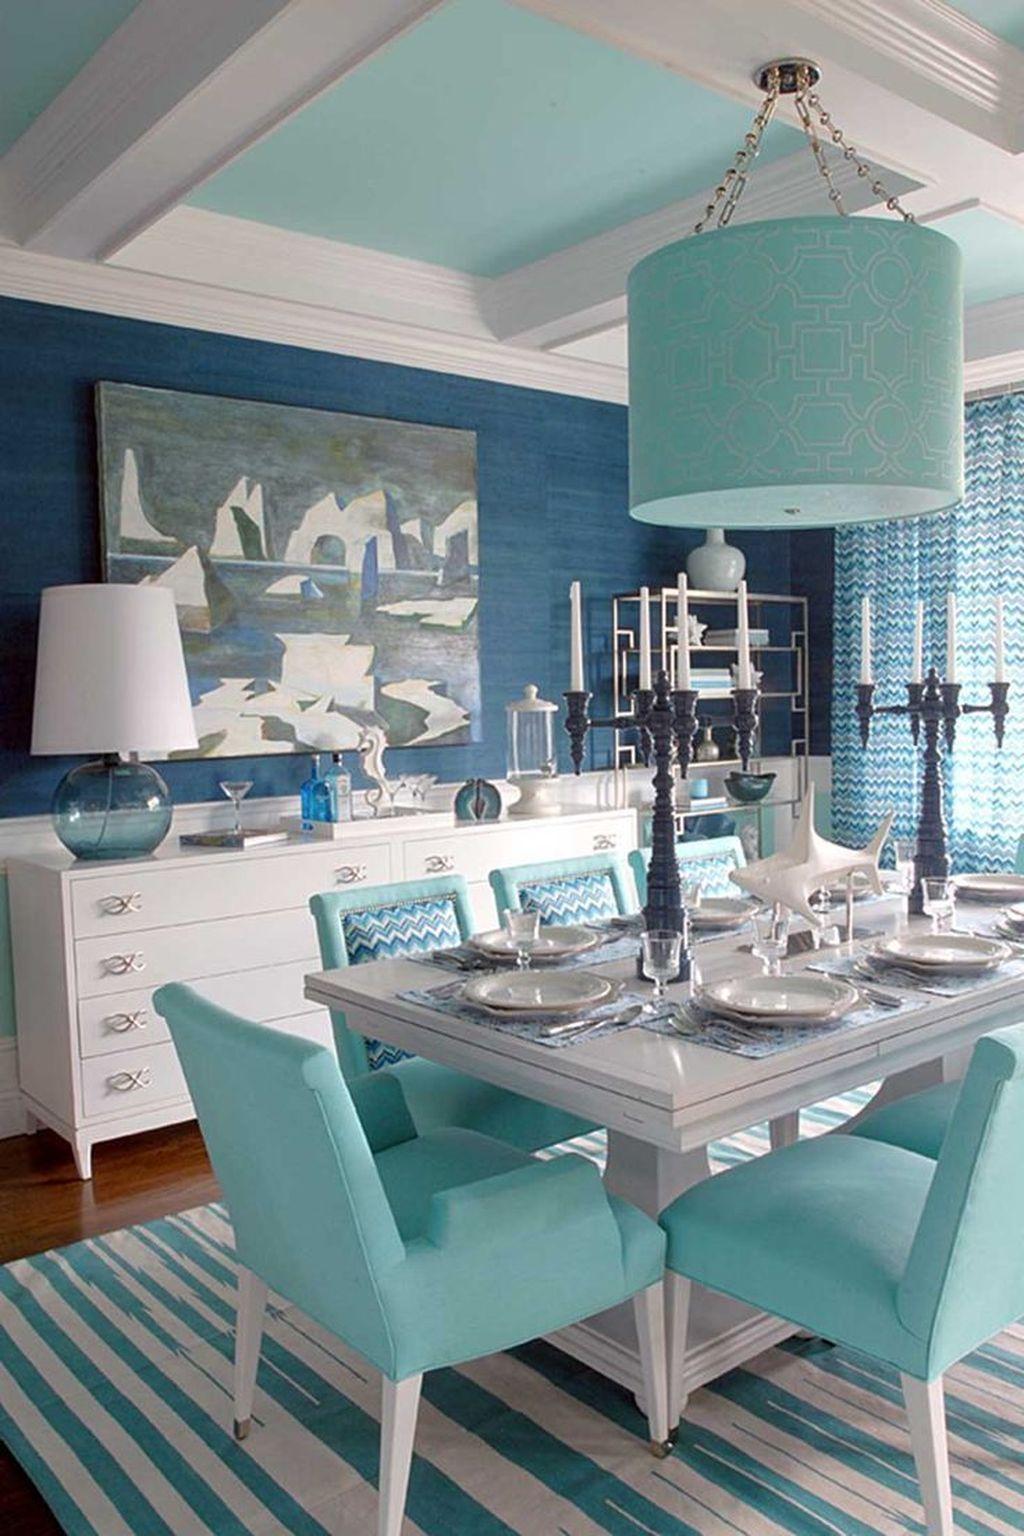 50 Amazing Nautical Dining Room Decor Ideas images